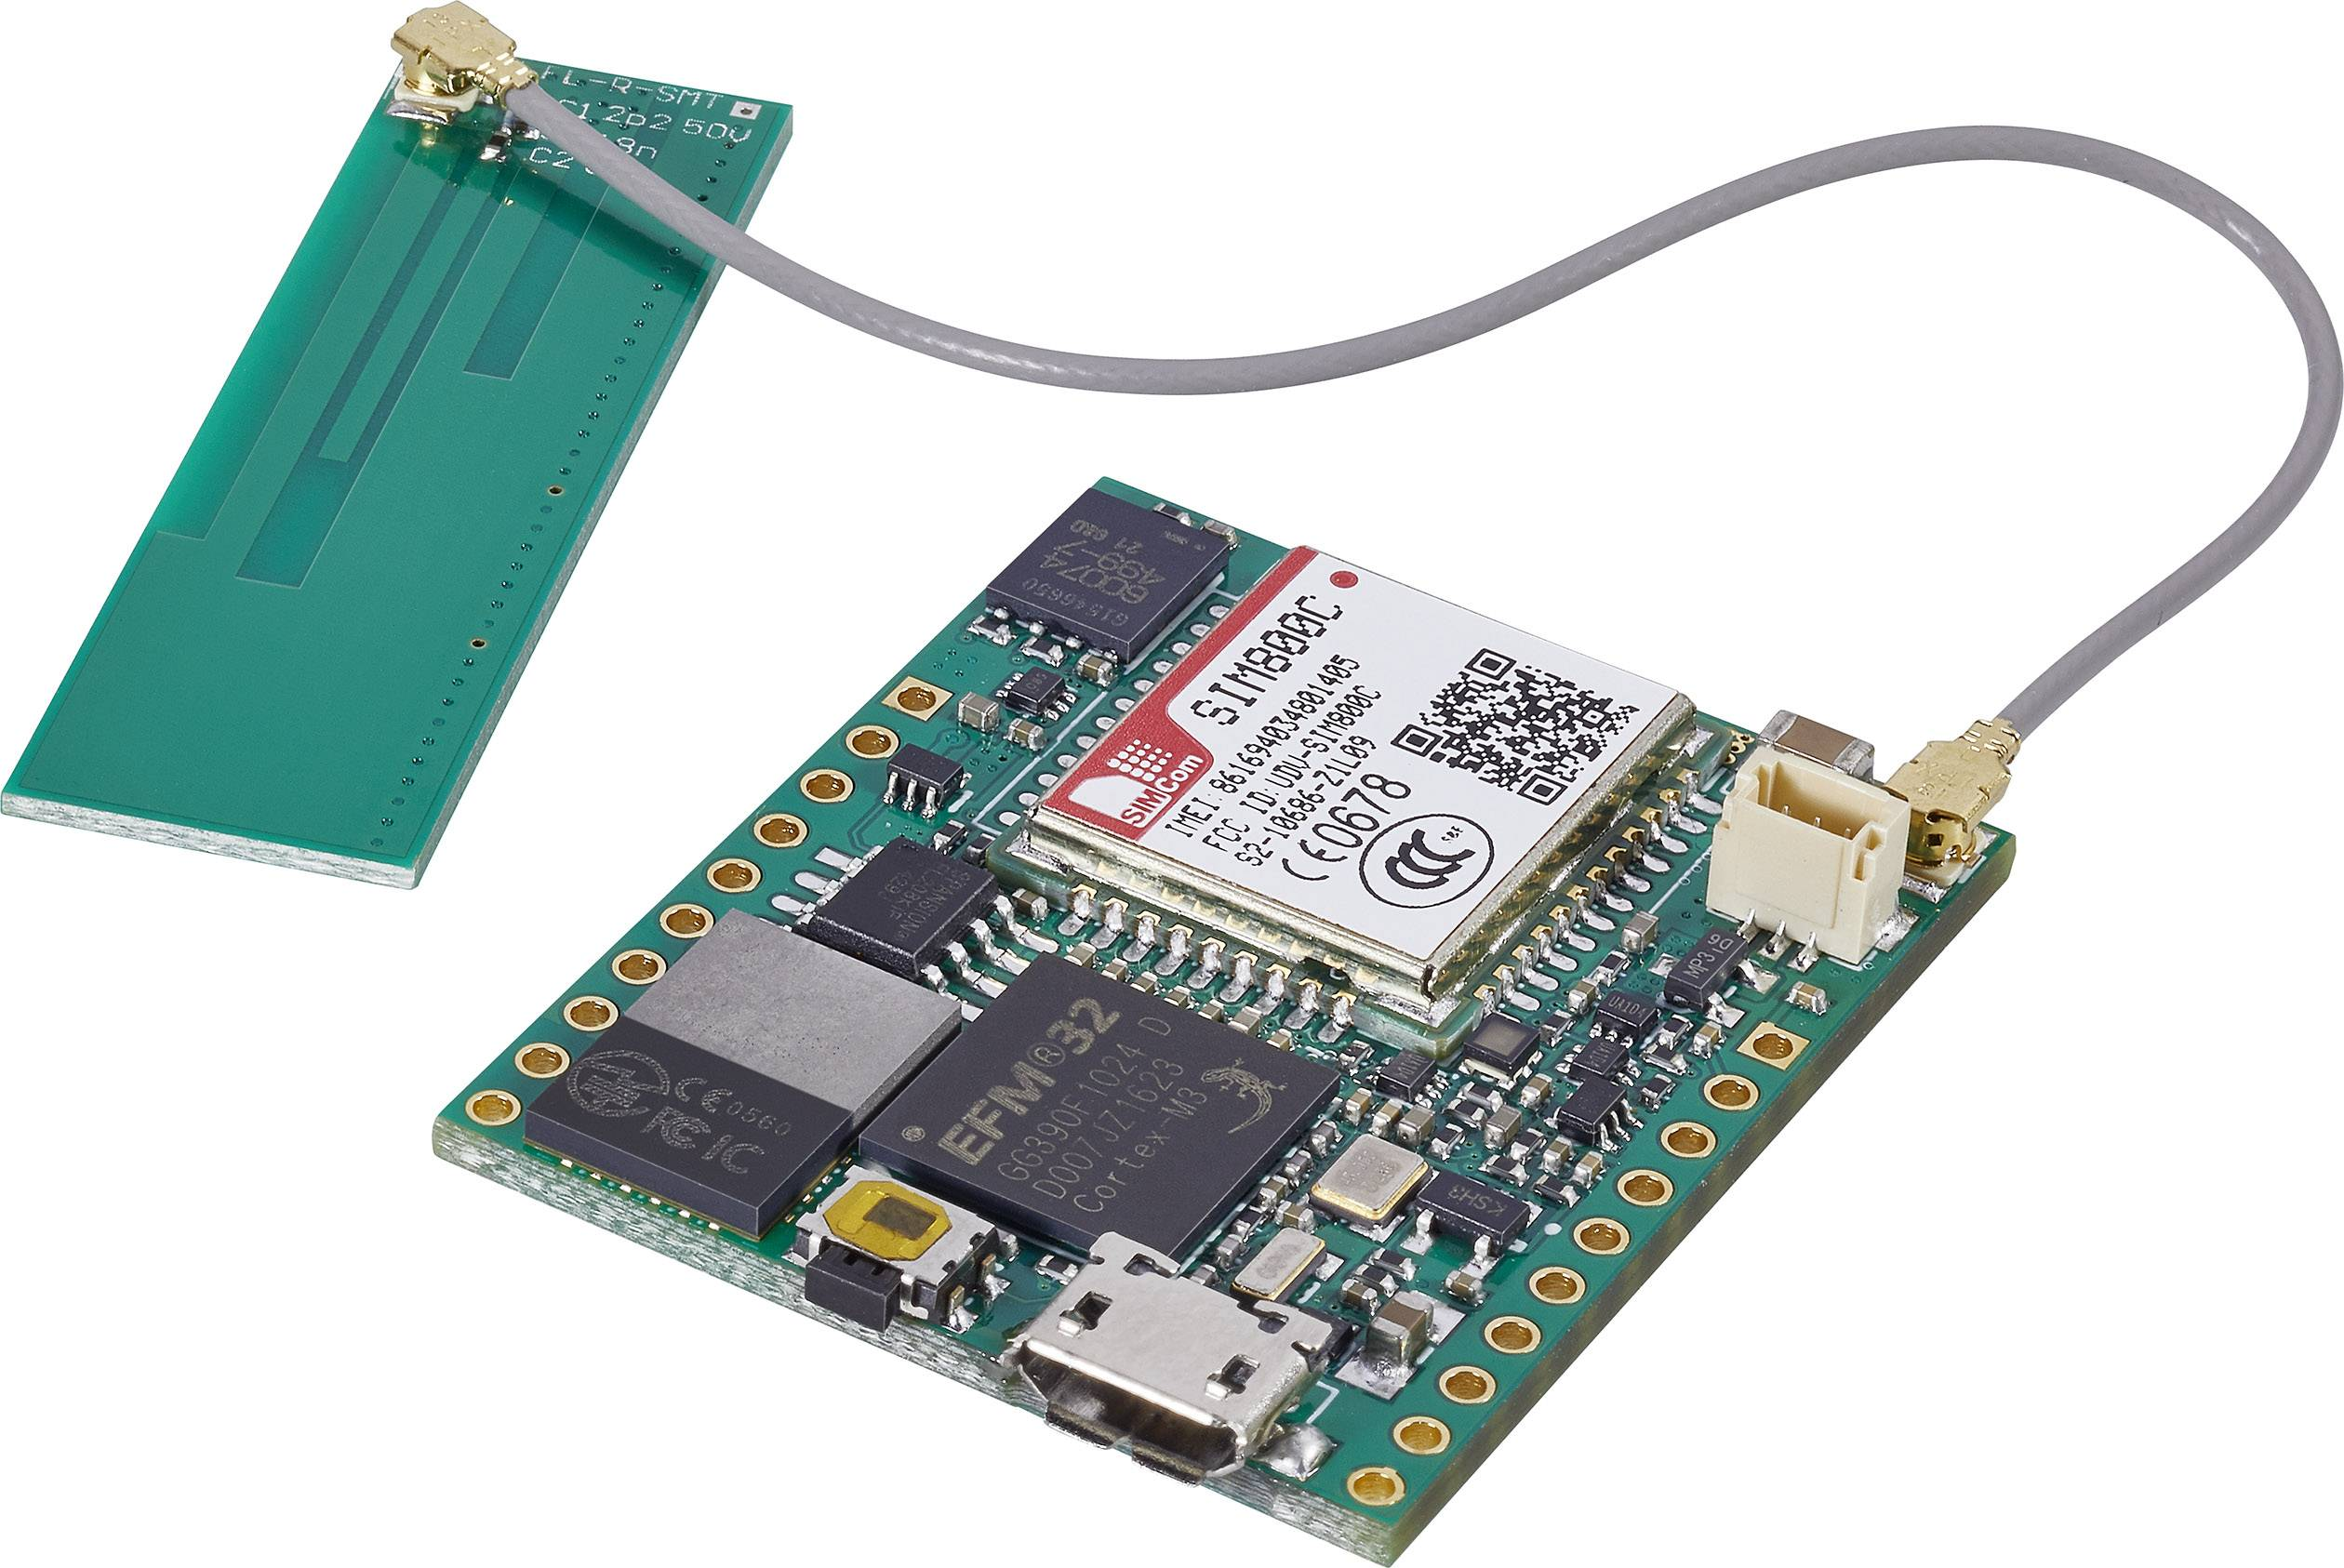 Štartovacia sada C-Control Embedded GSM Modul, 32 Bit ARM Cortex-M3 MCU IoT-Starter Kit 10